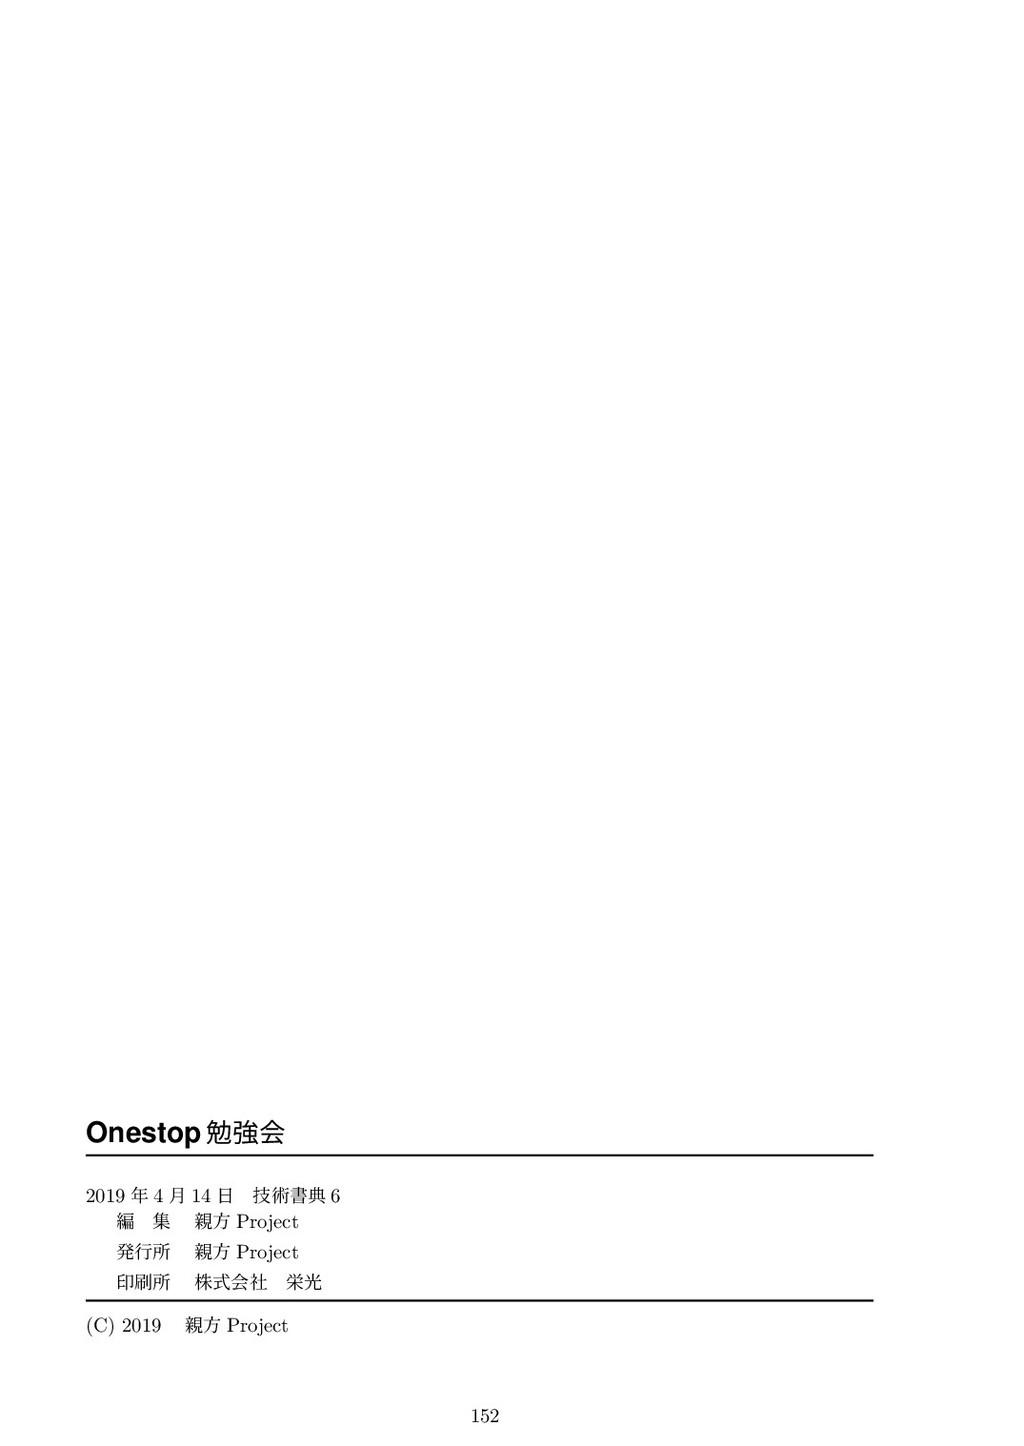 Onestop 勉強会 2019 年 4 ⽉ 14 ⽇技術書典 6 編集 親⽅ Proje...